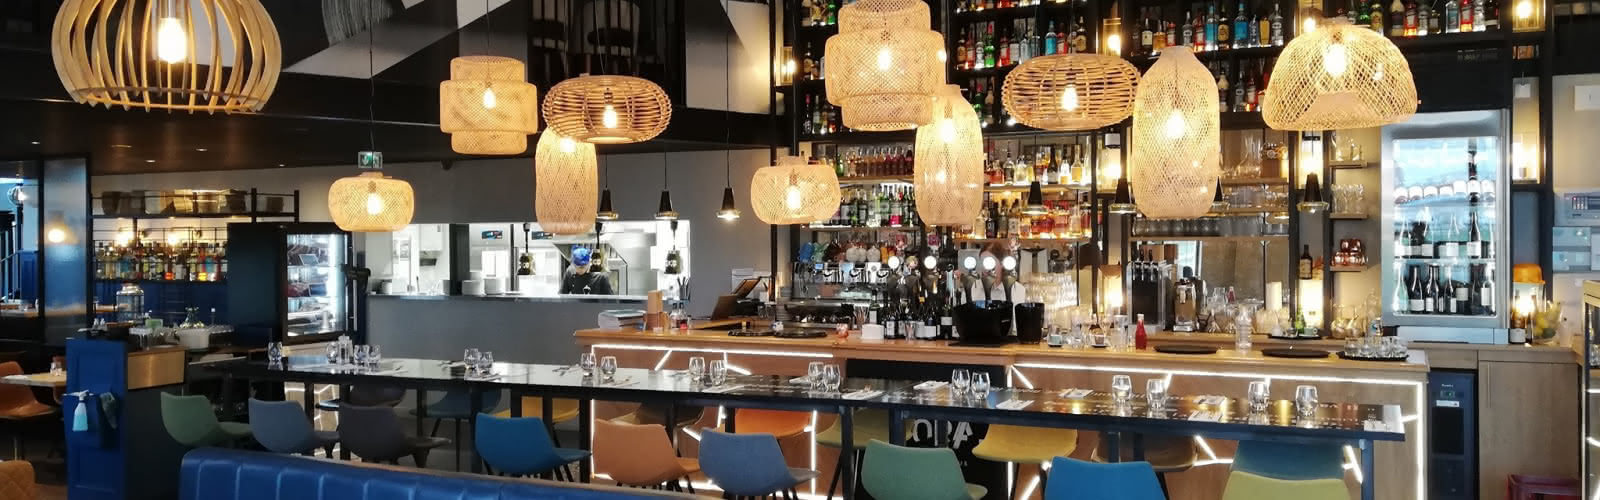 Restaurant L'Agora